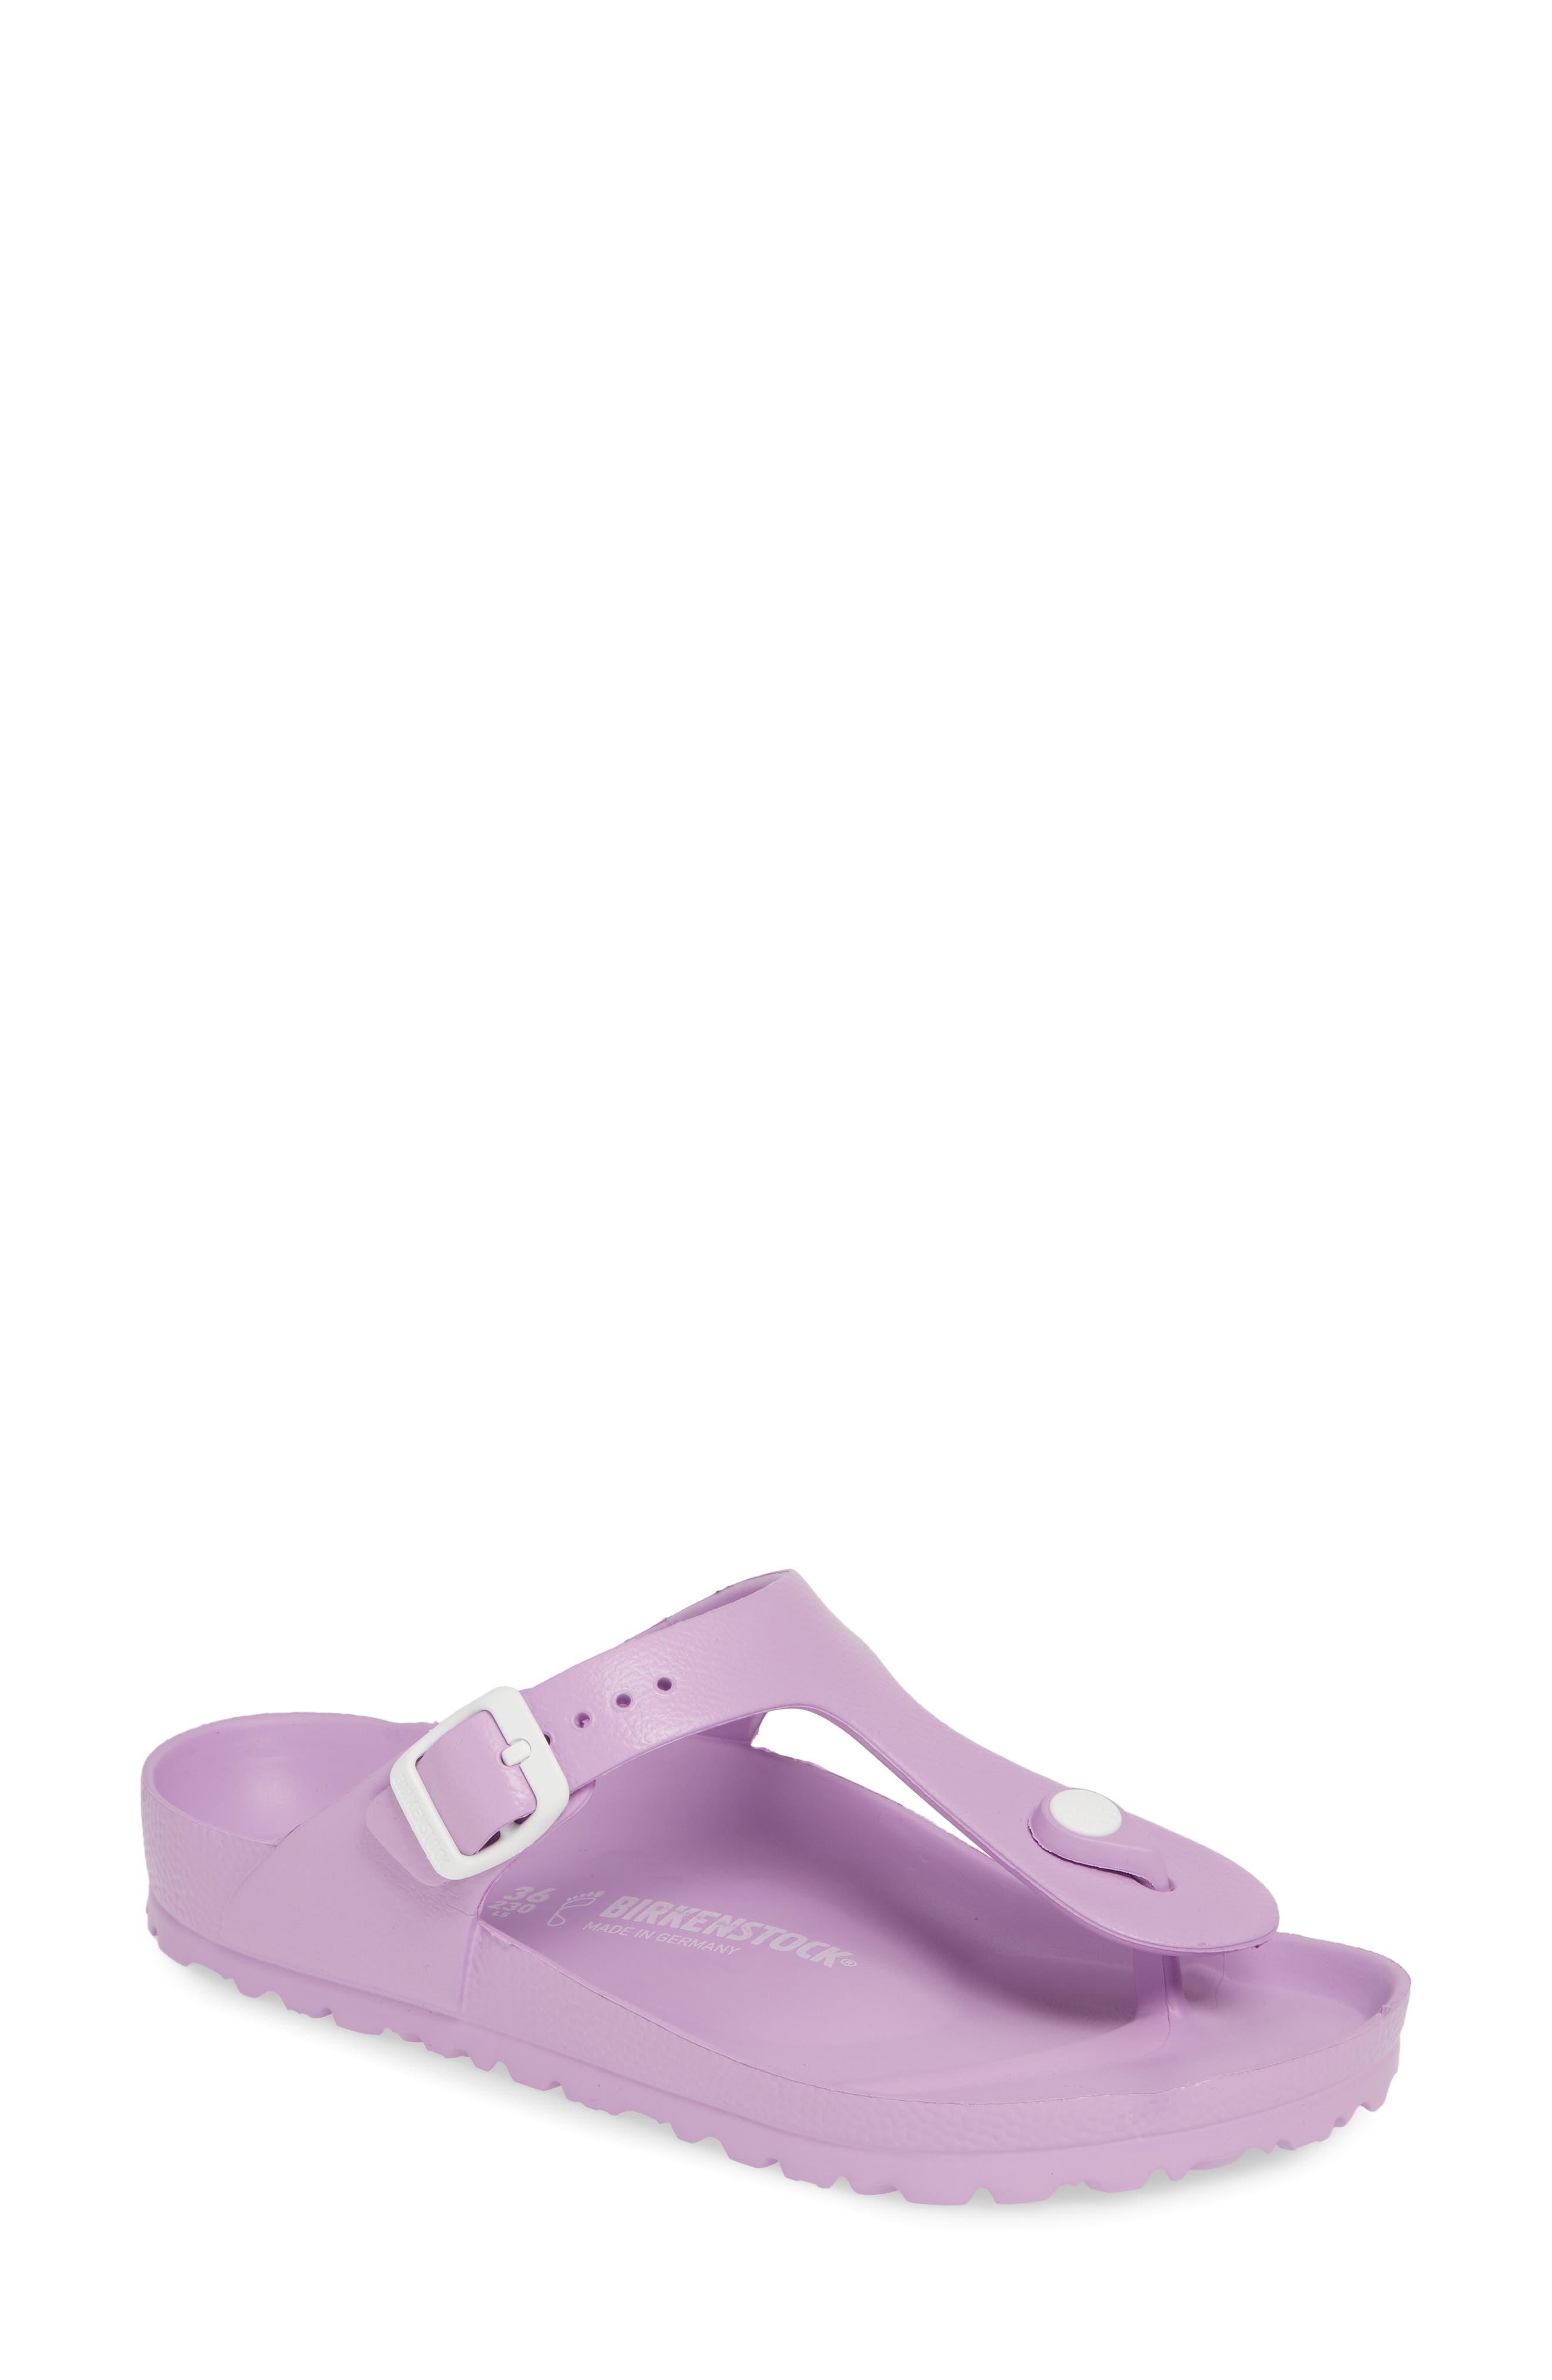 Birkenstock Essentials - Gizeh Flip Flop - Purple